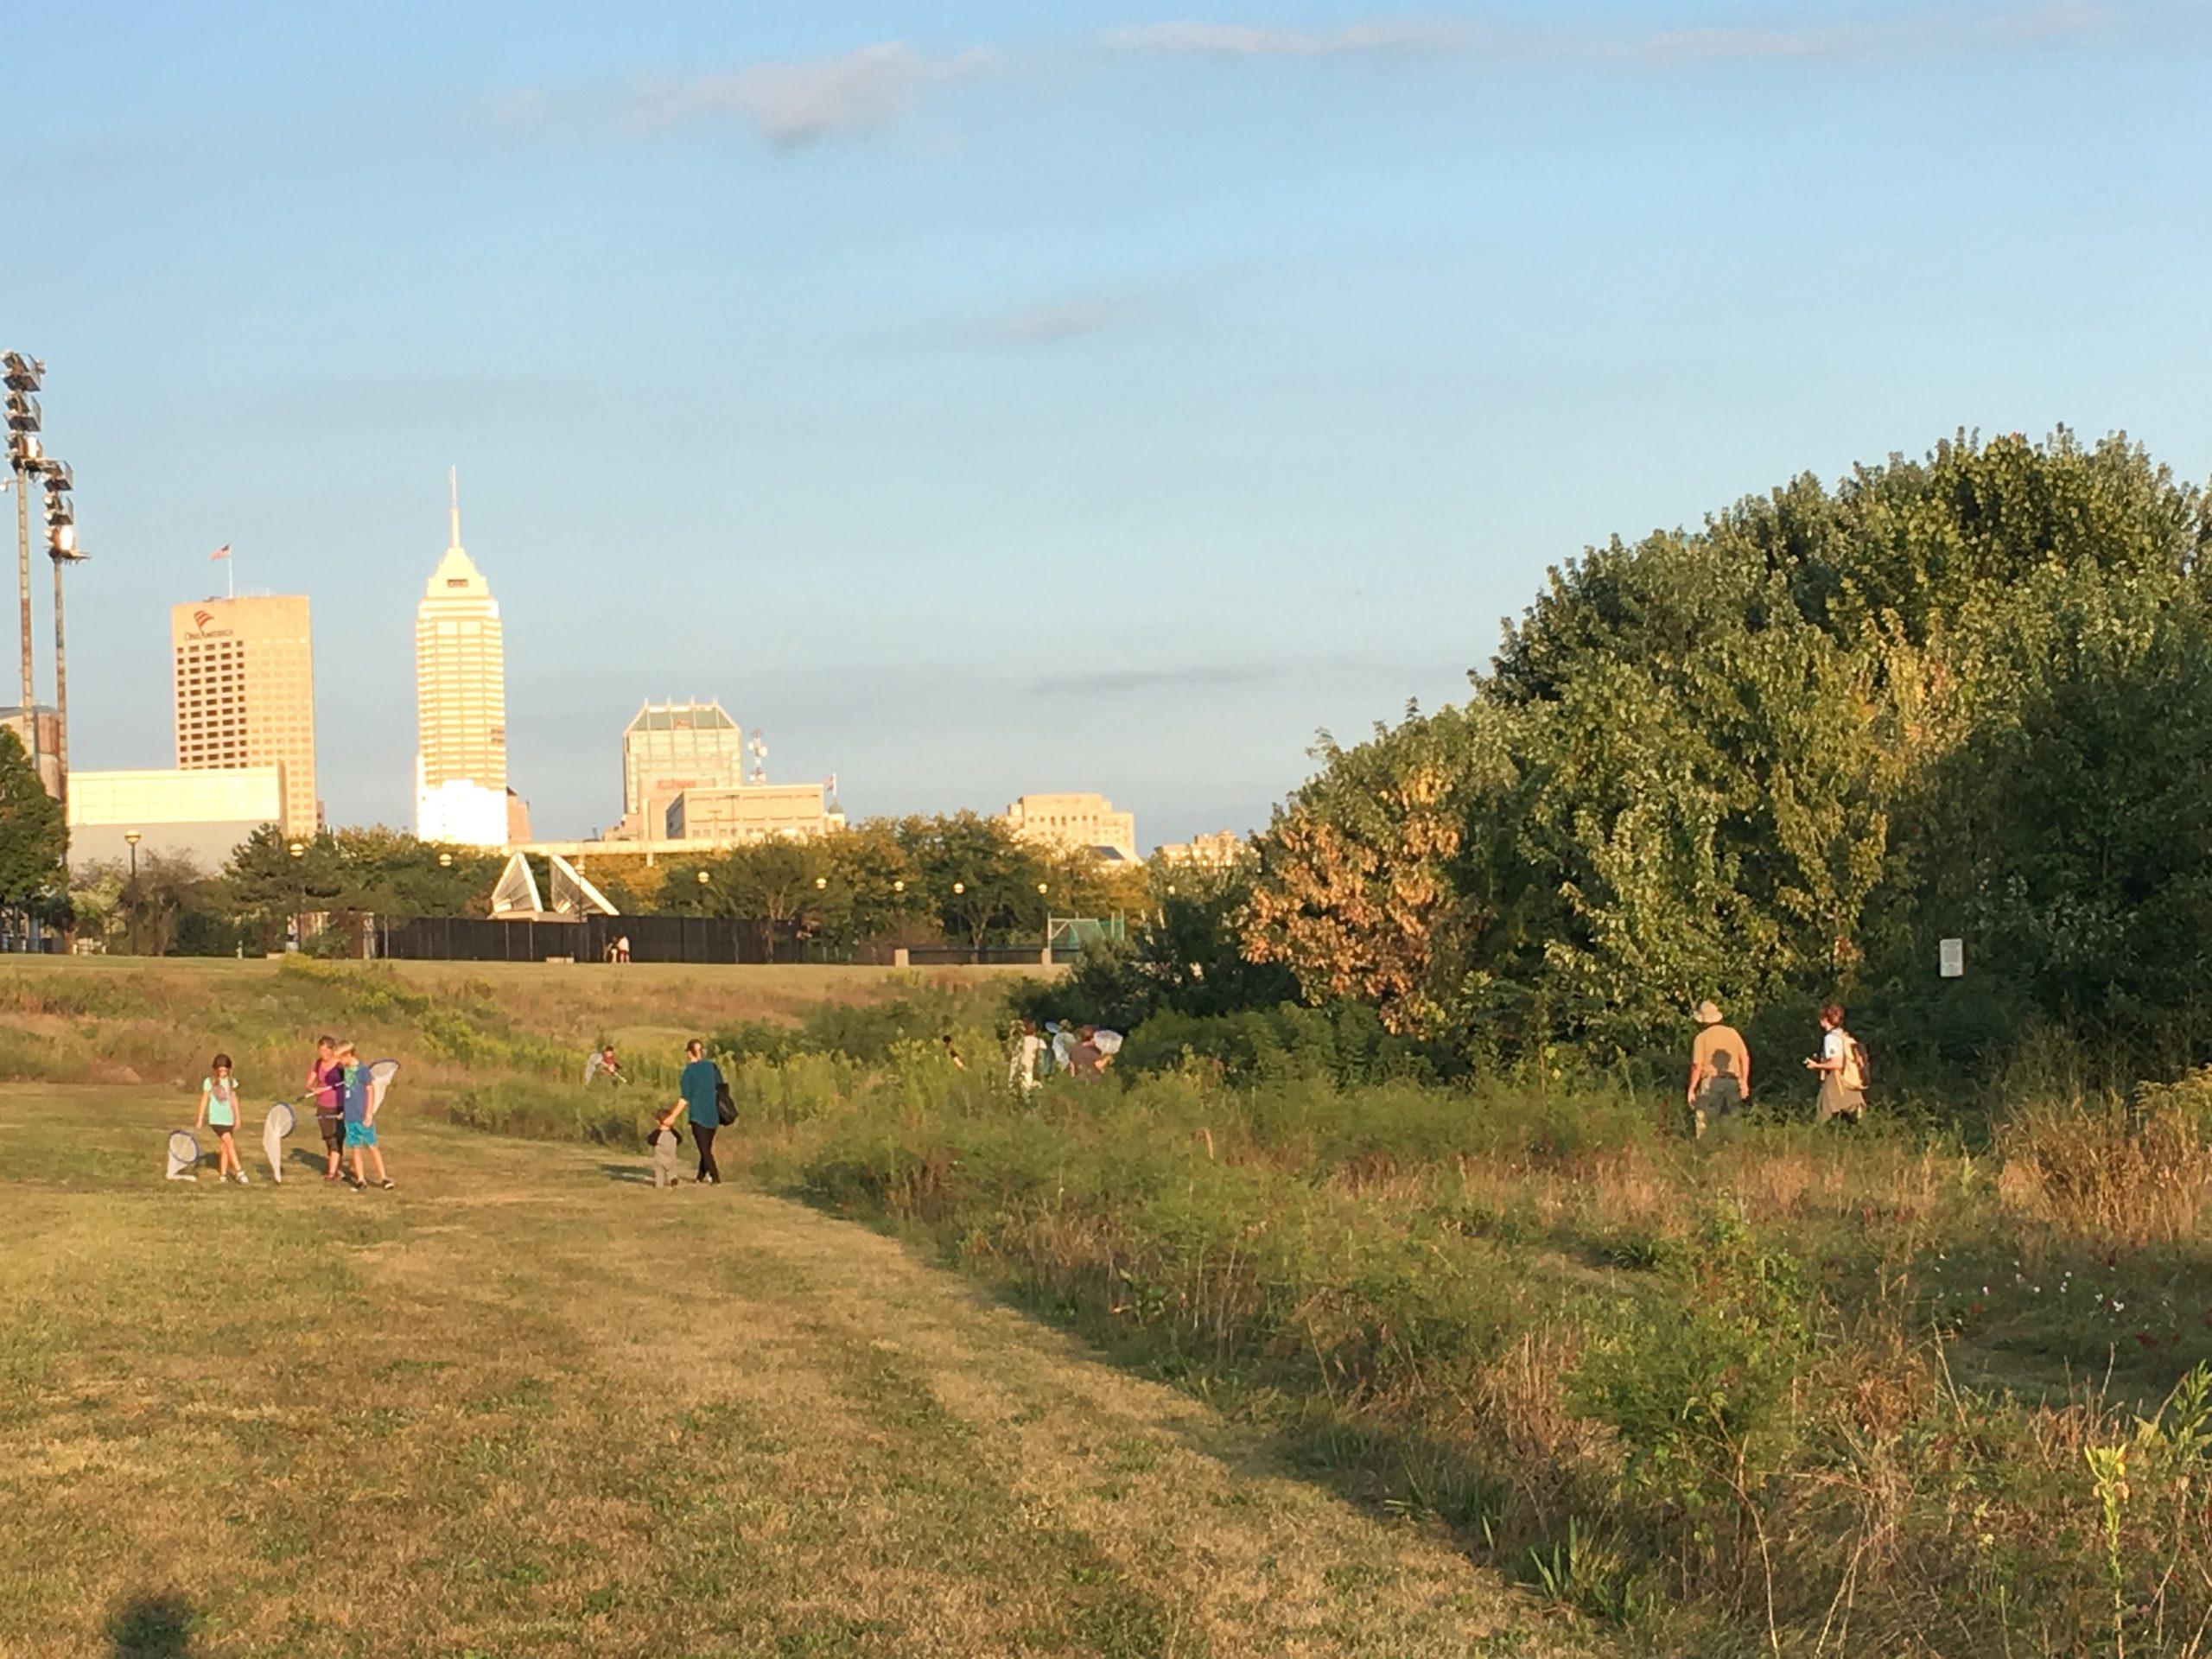 Skyline of Indianapolis, Indiana